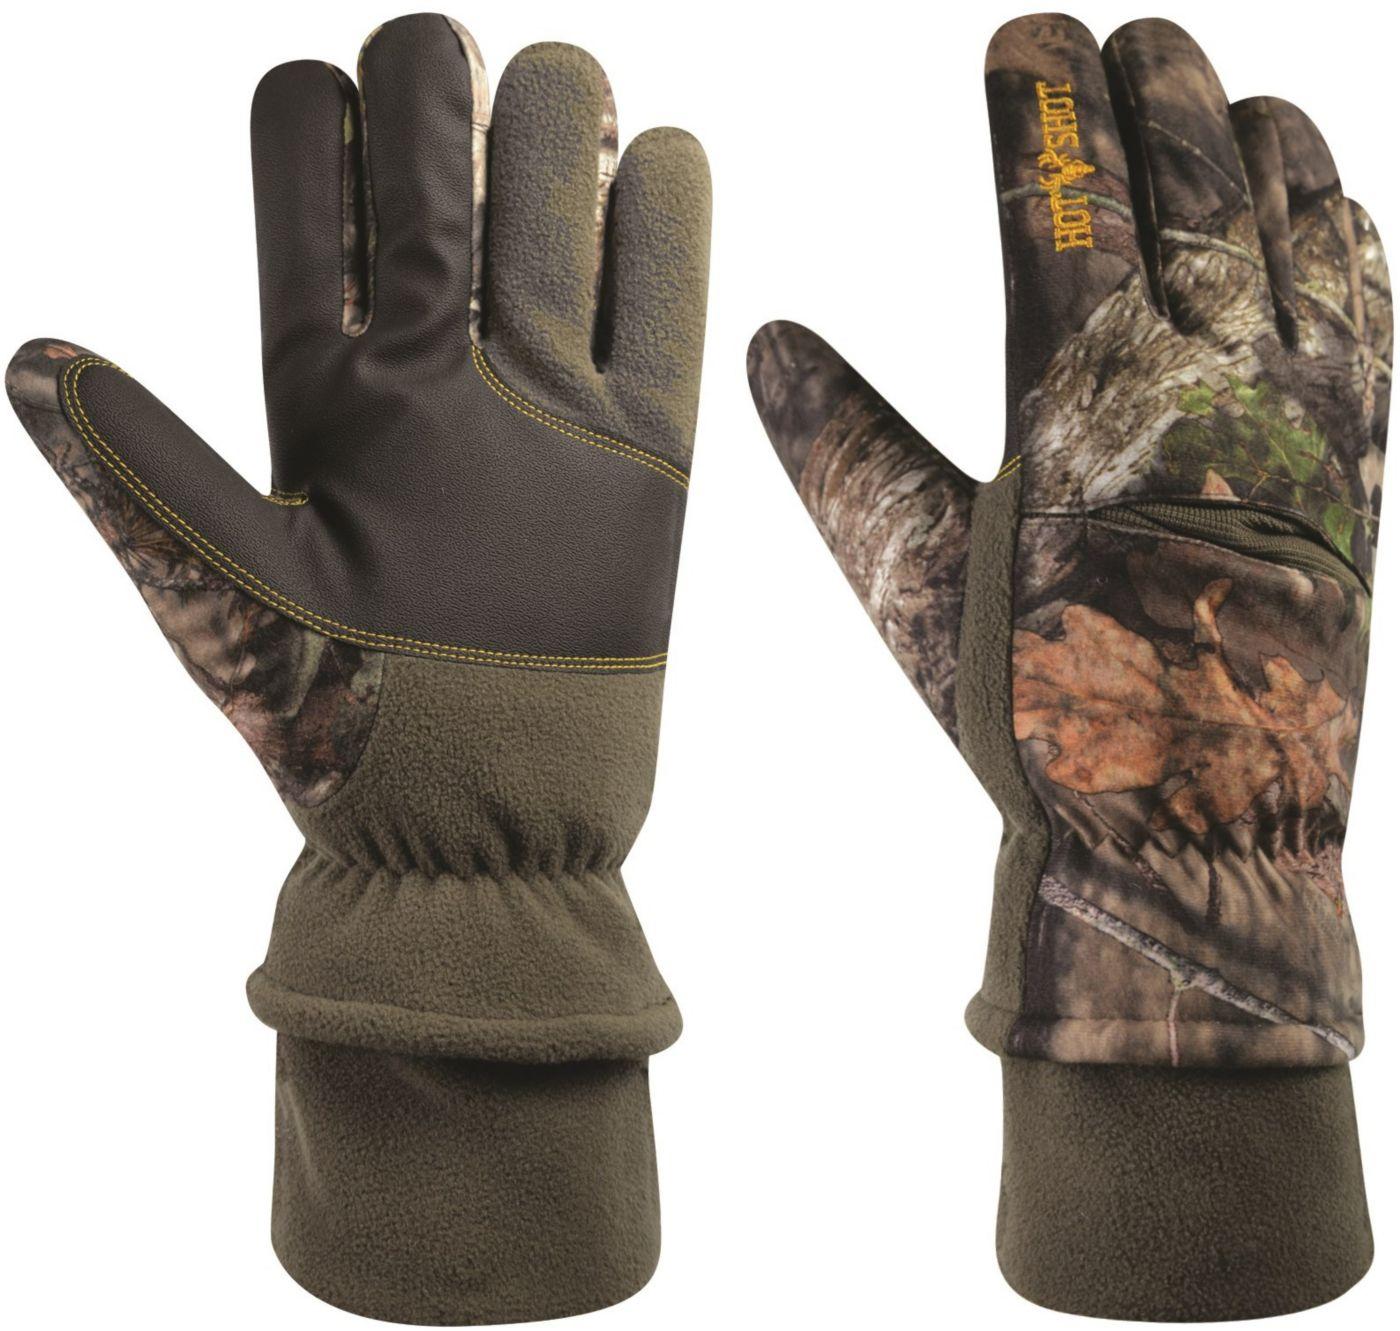 Hot Shot Men's Waterproof Insulated Hunting Gloves